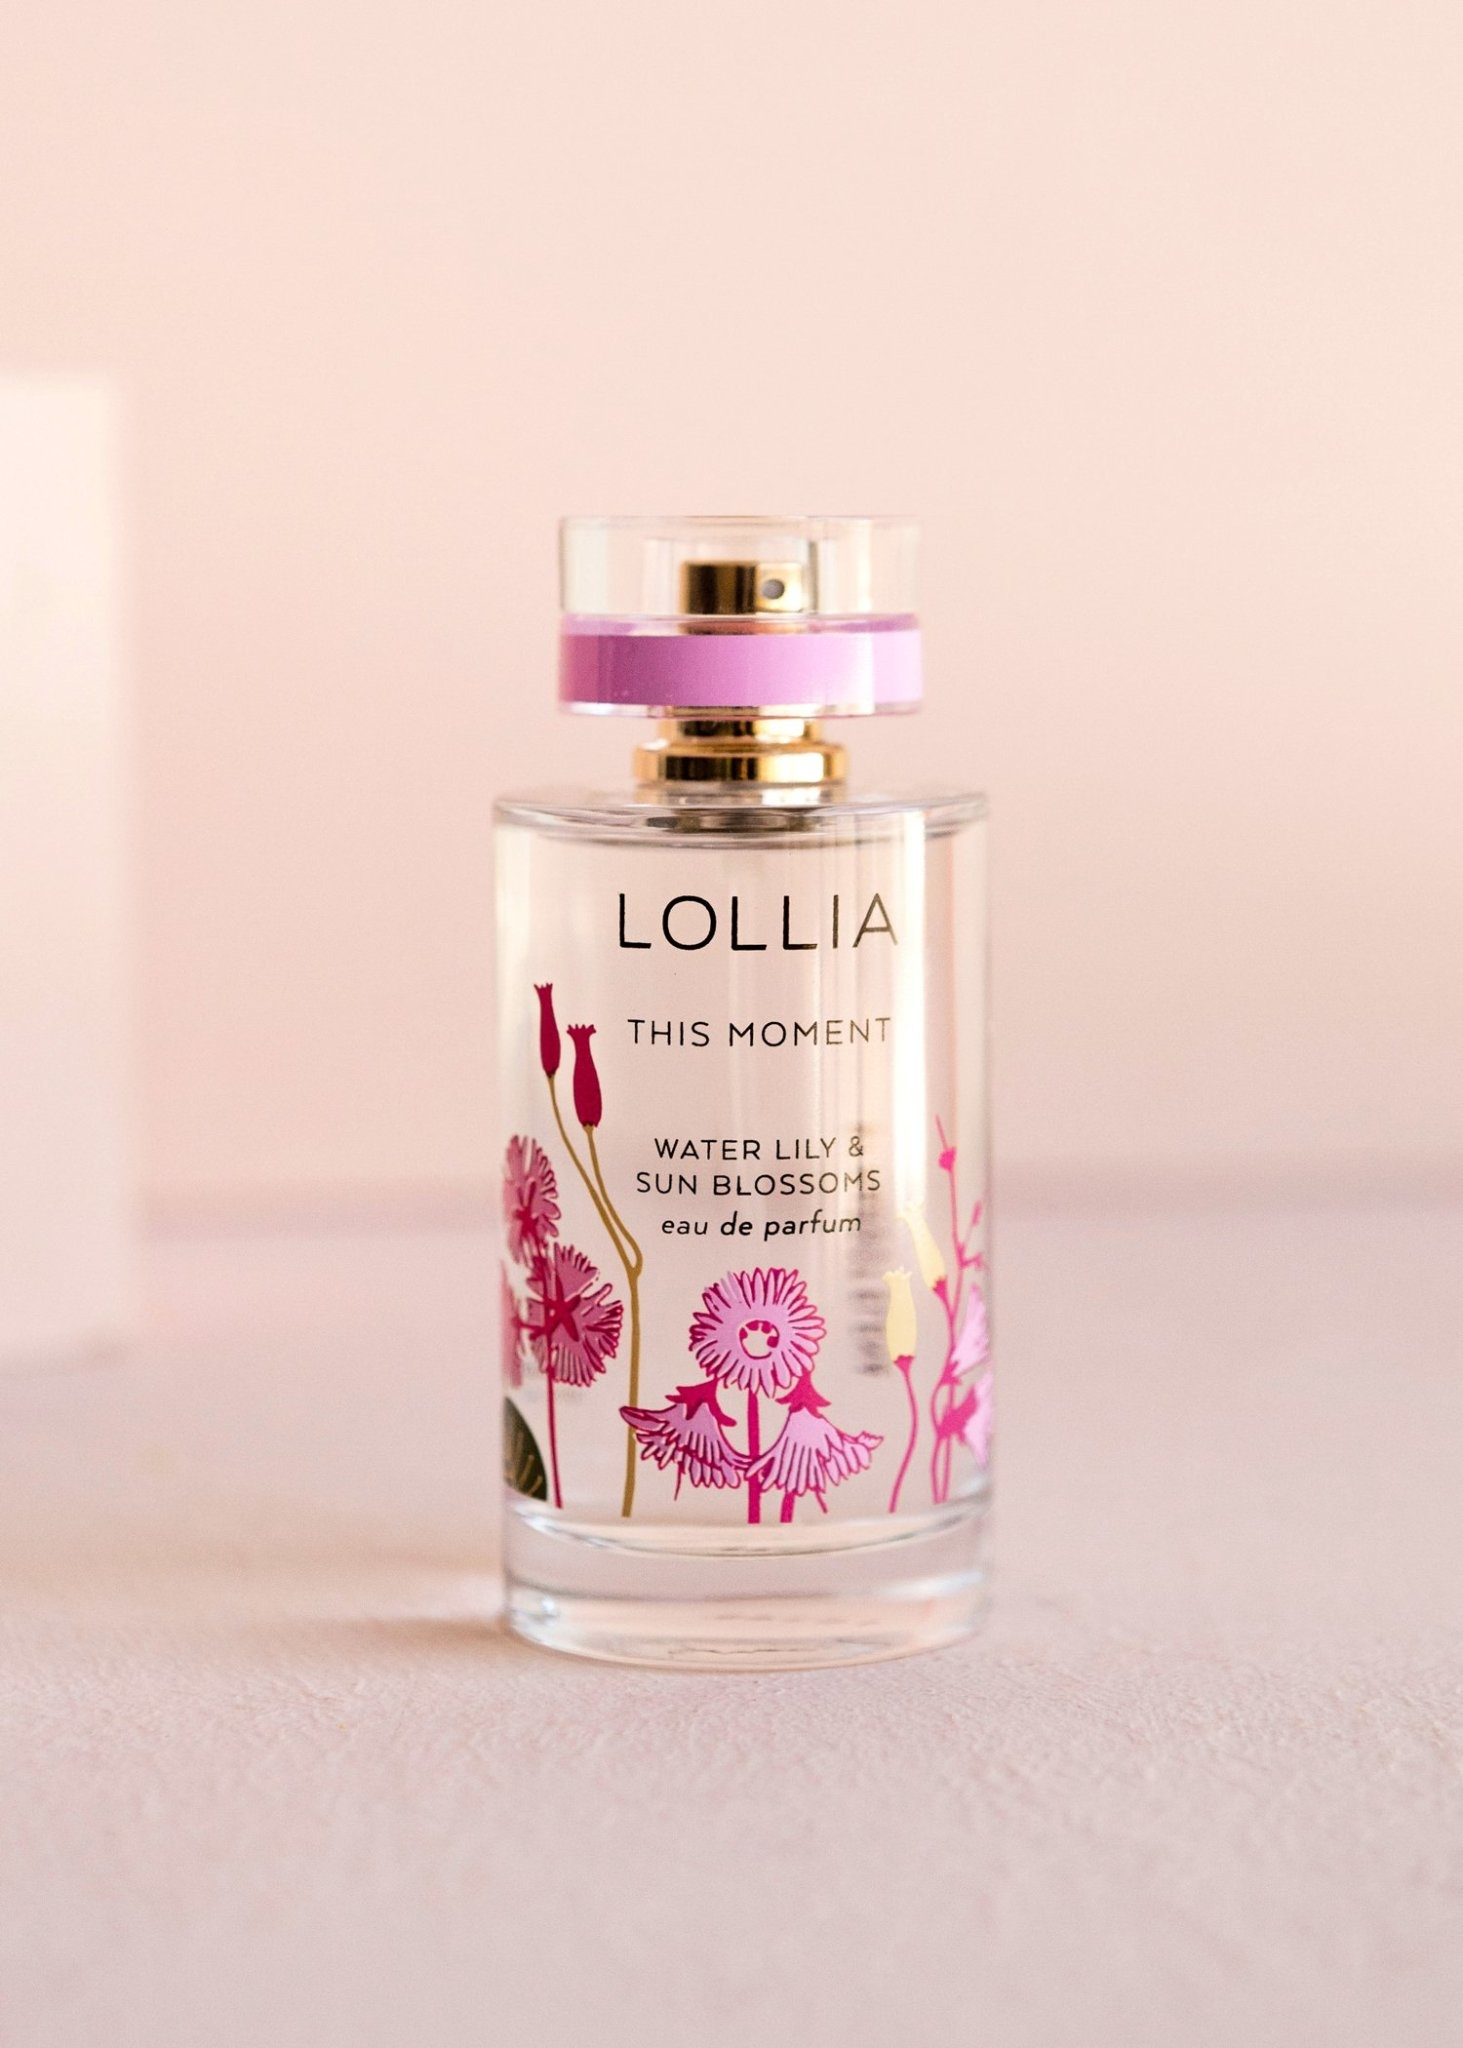 Lollia This Moment Perfume